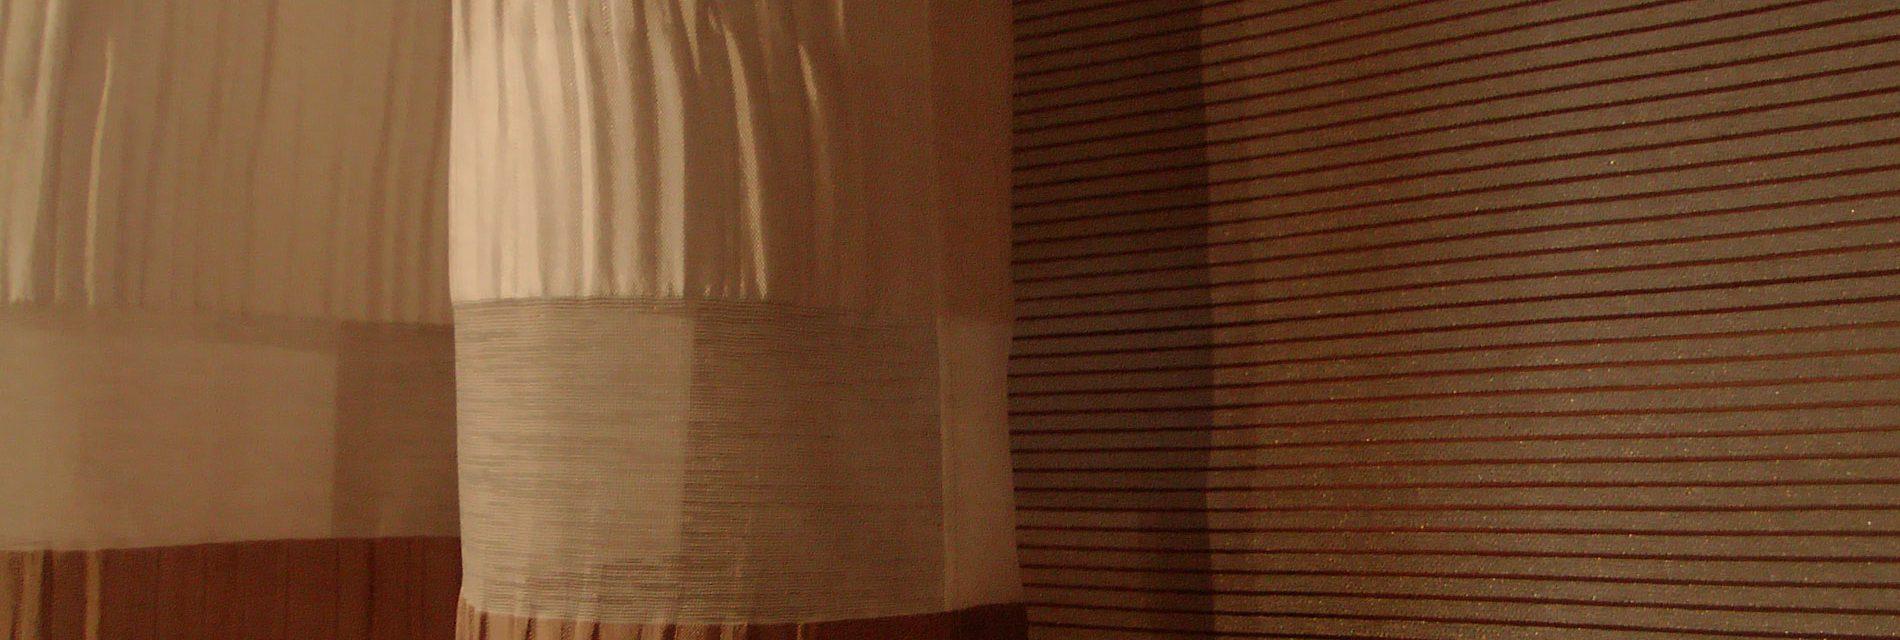 gardinen breuss aus elmshorn gardinendekorationen sonnenschutz insektenschutz k lteschutz. Black Bedroom Furniture Sets. Home Design Ideas